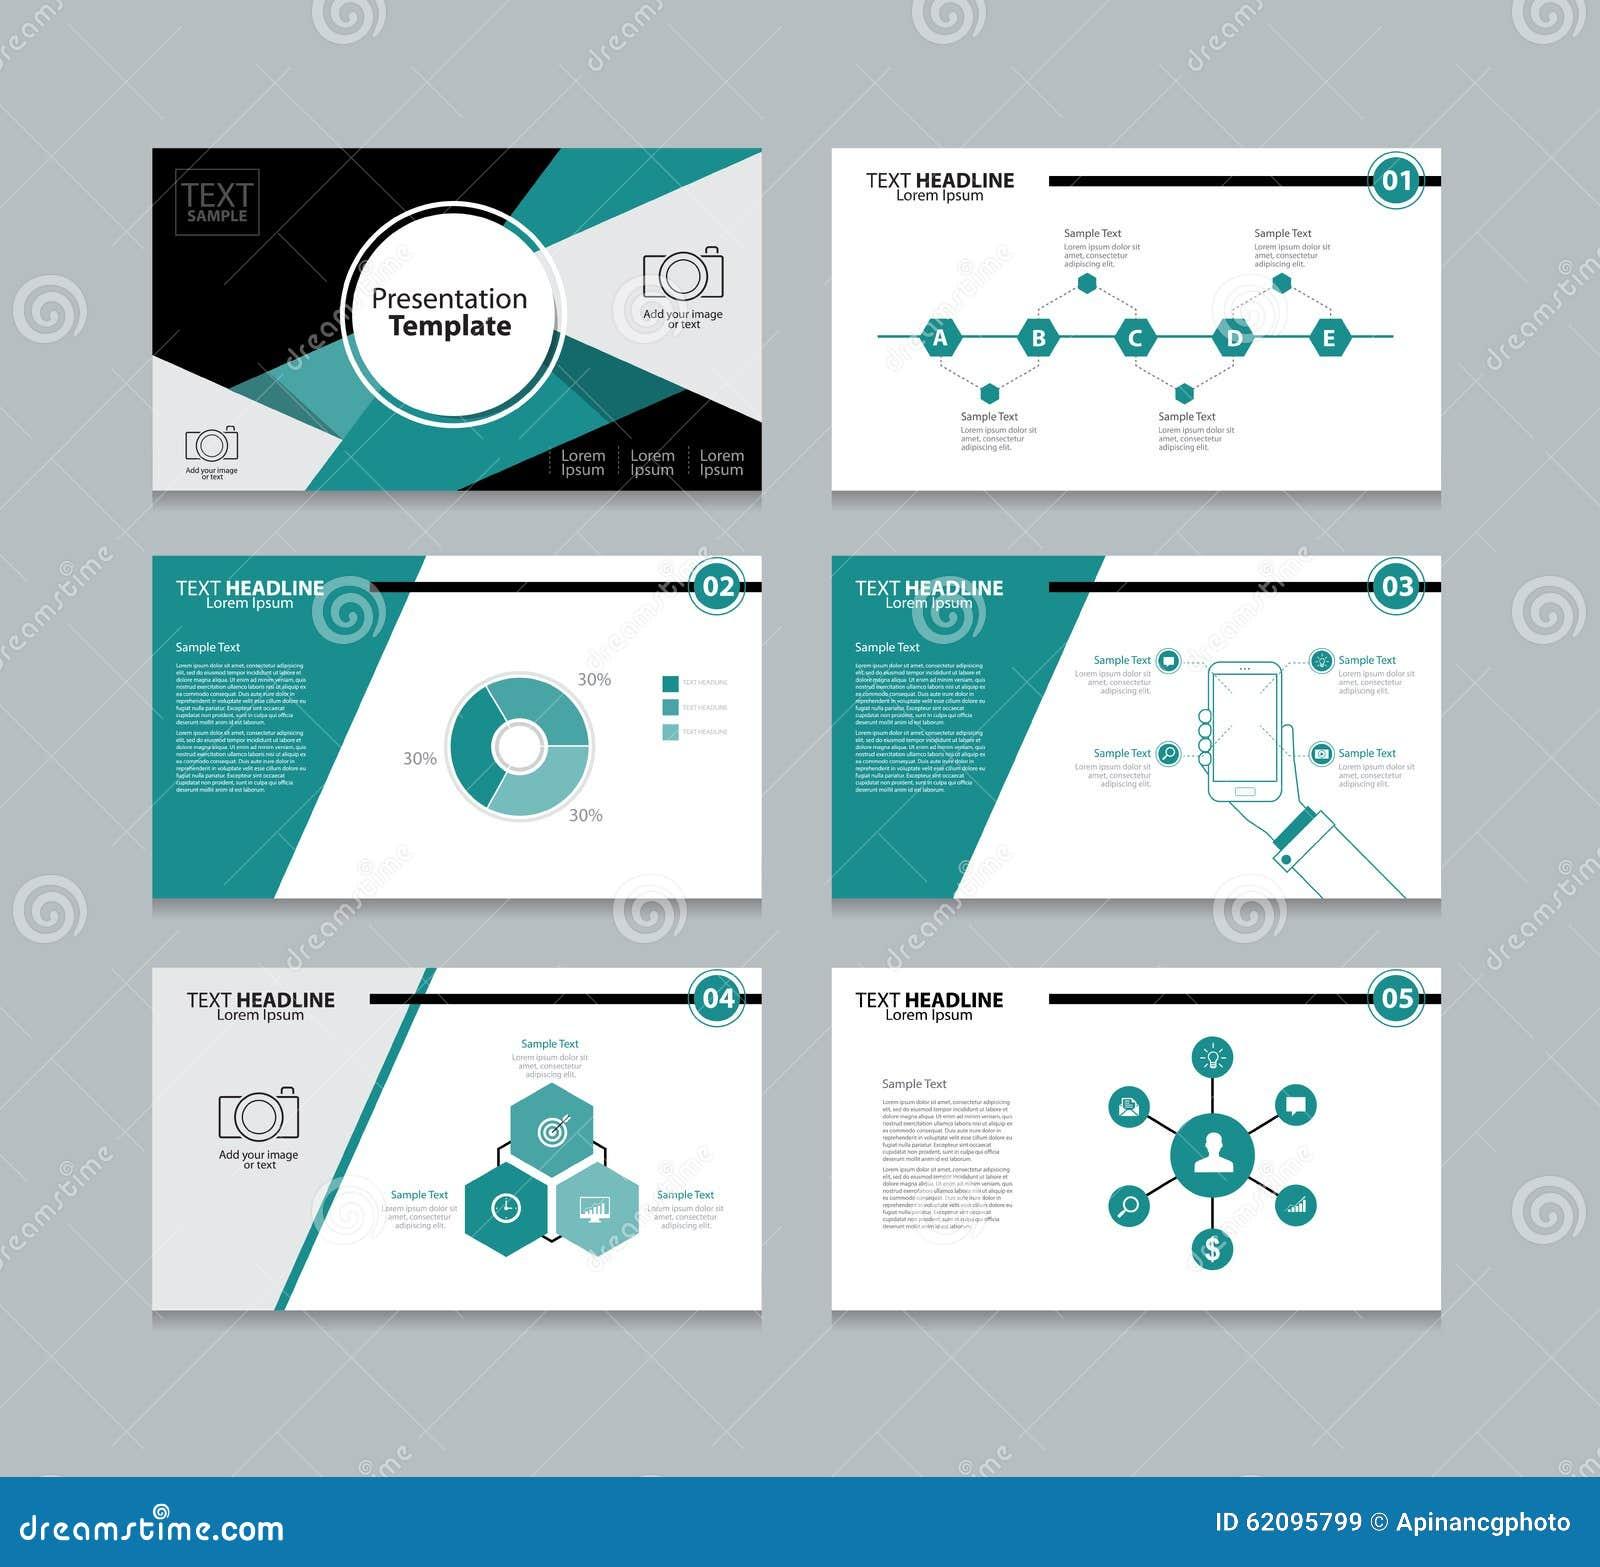 abstract vector template presentation slides background design, Presentation templates